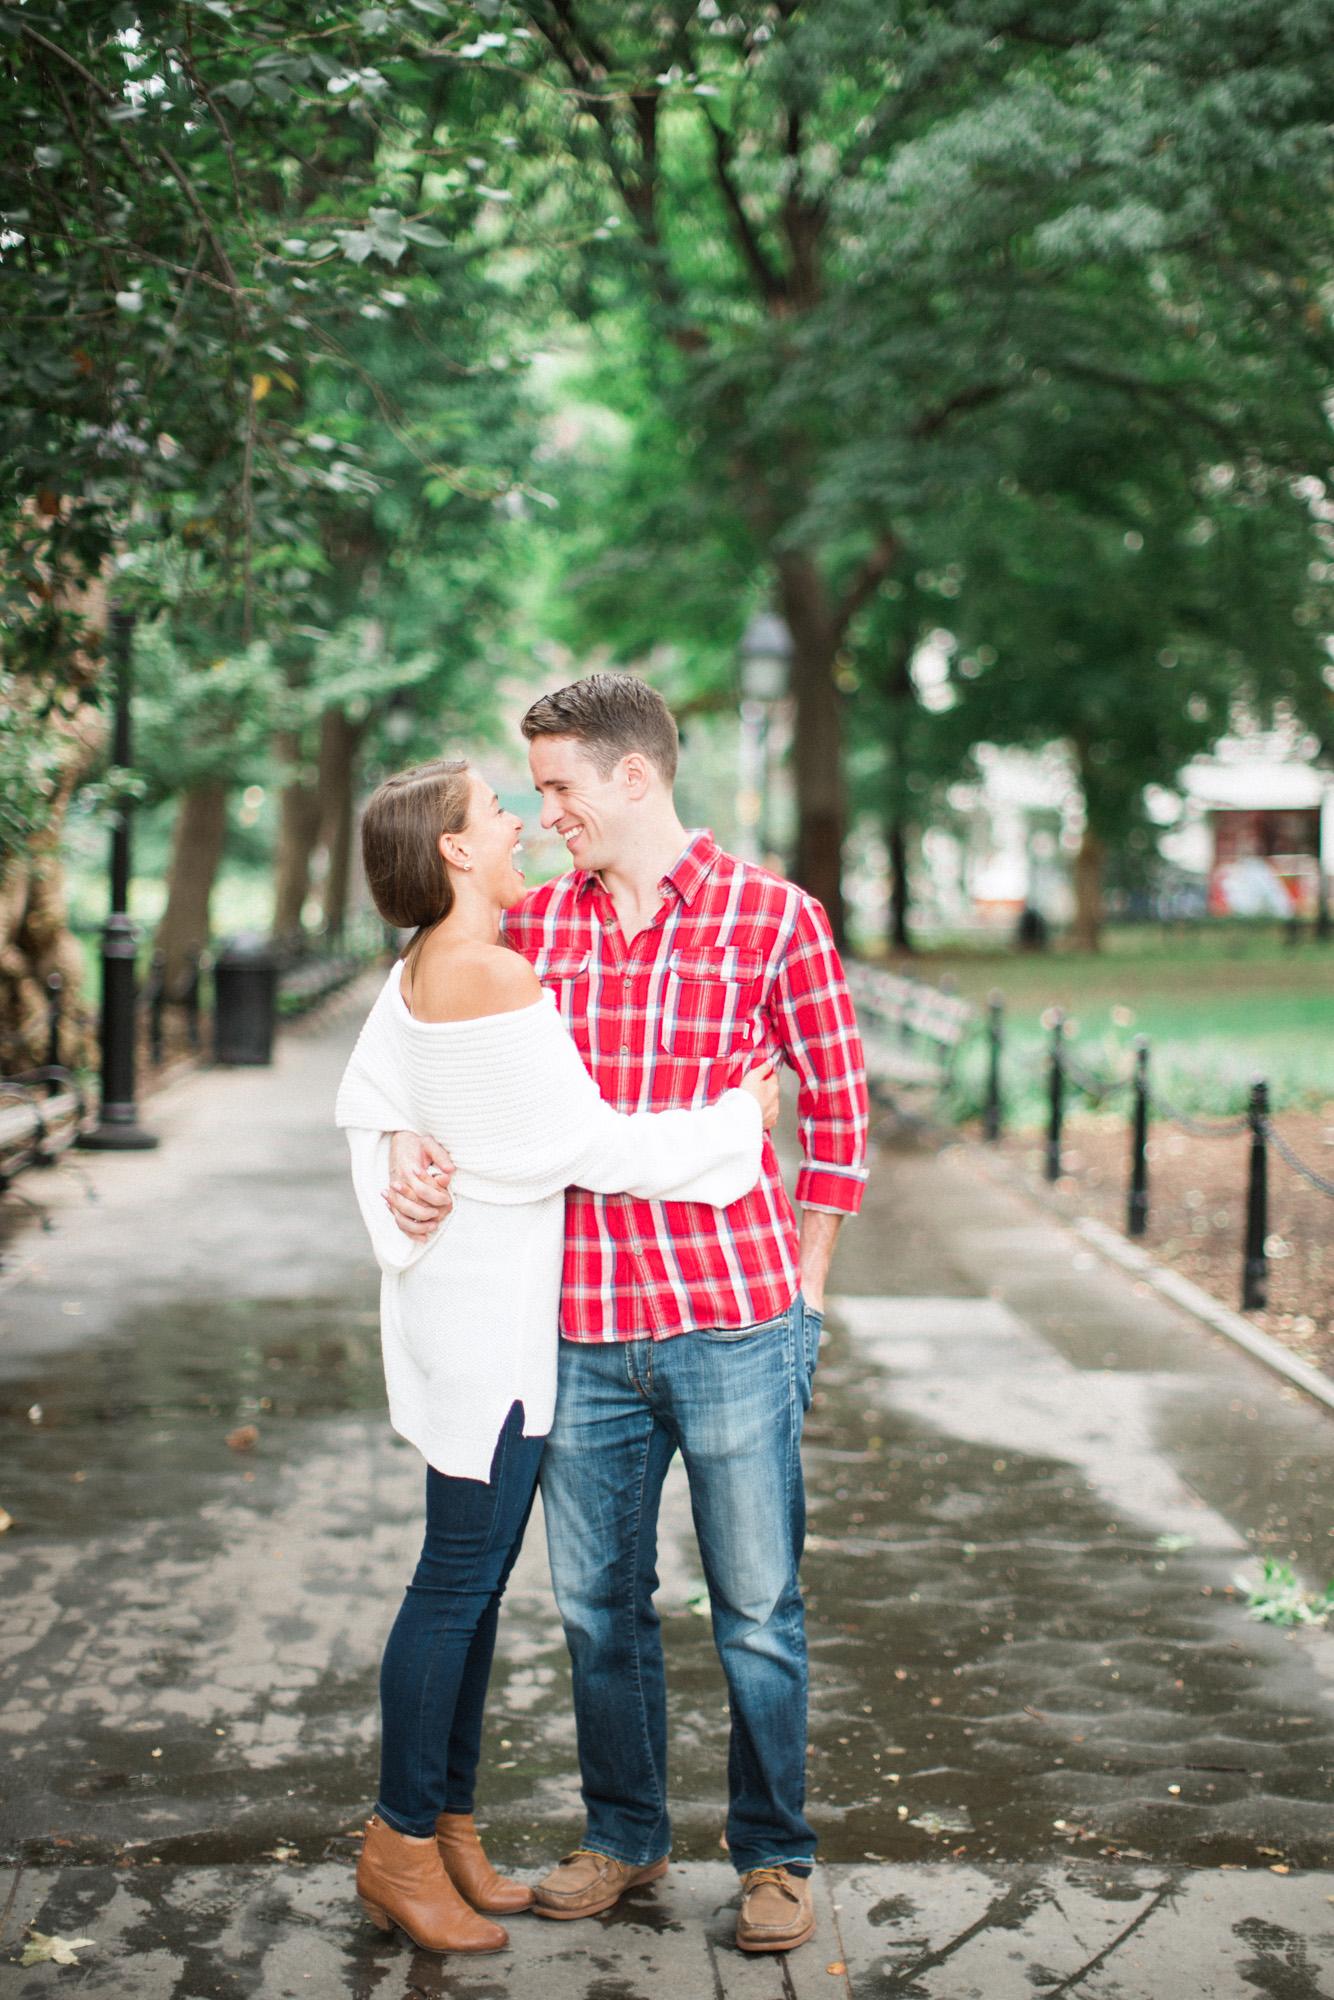 new-york-city-wedding-photography-hunter-ryan-photo-05144.jpg